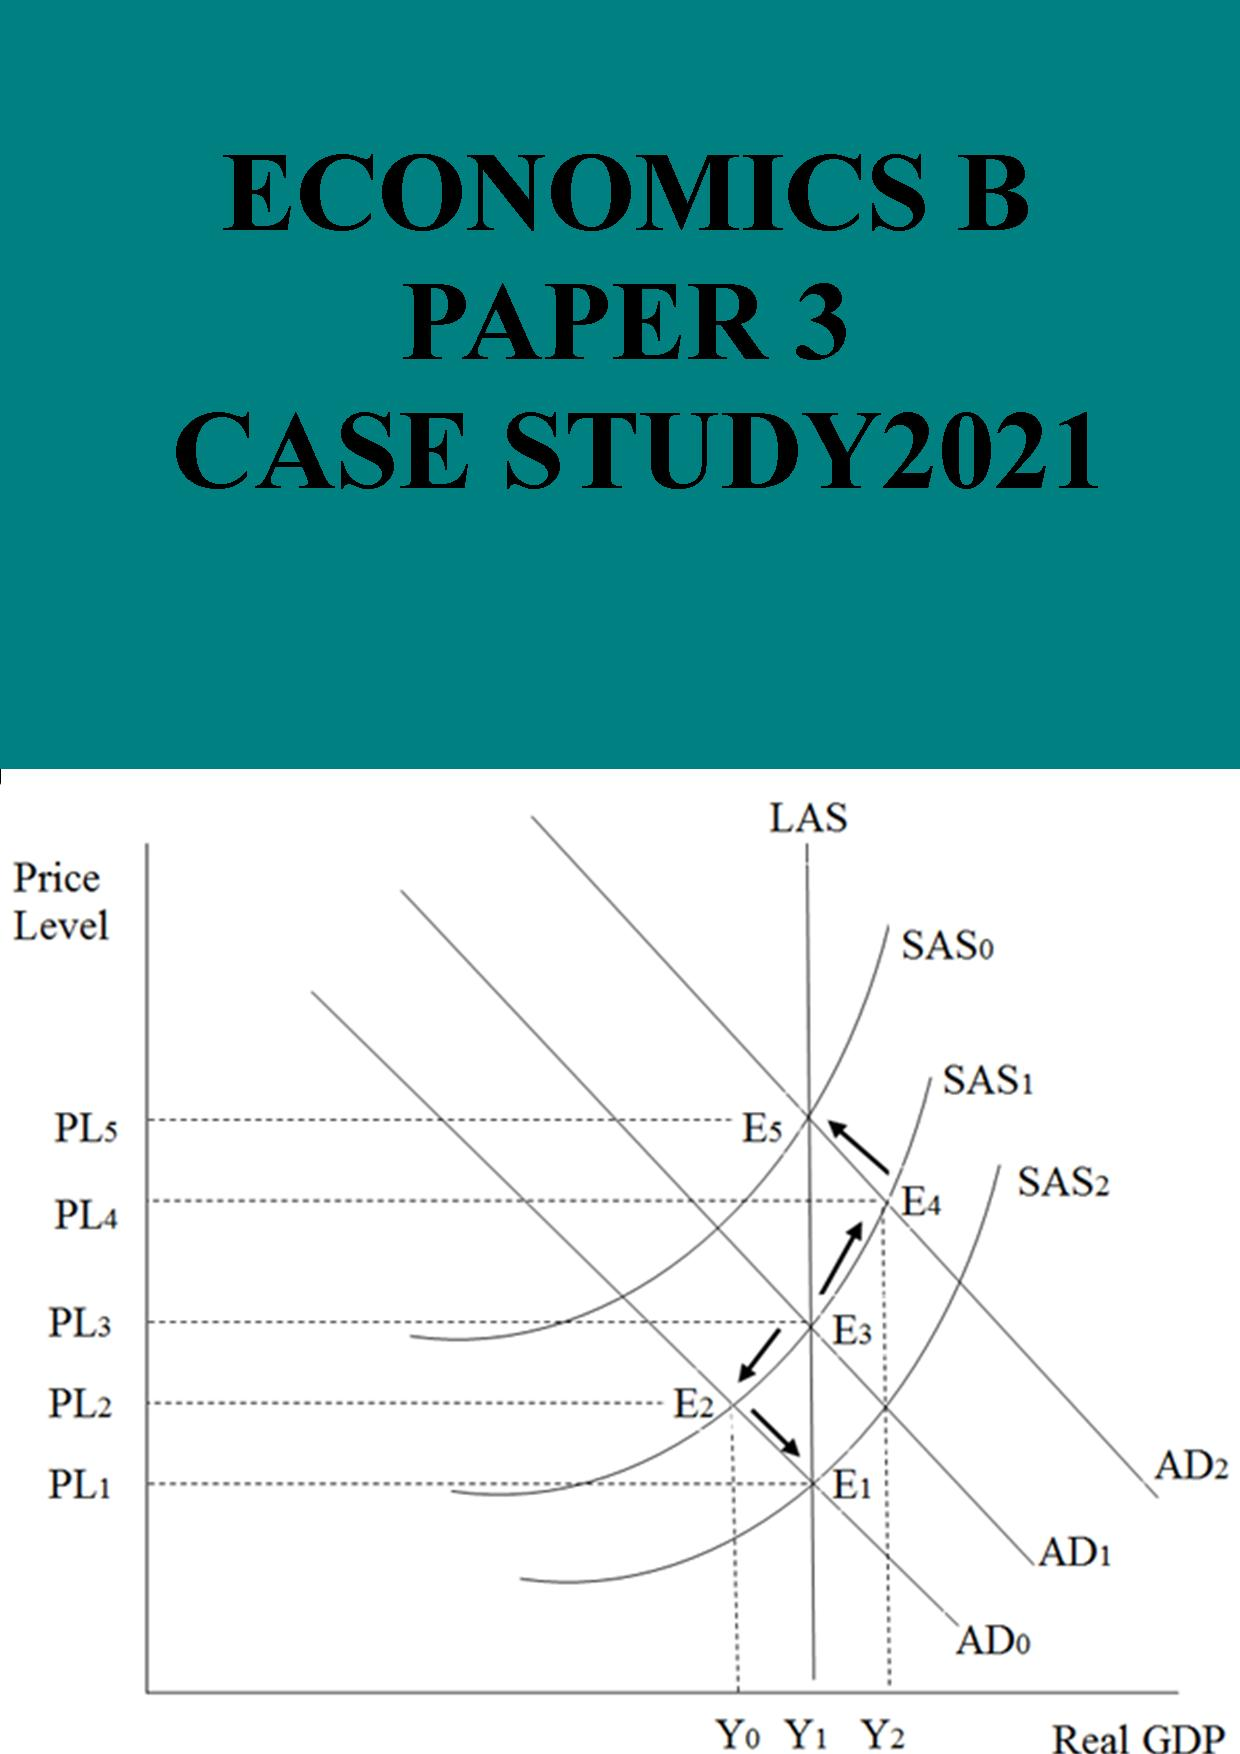 Paper 3 Case Study - 2021